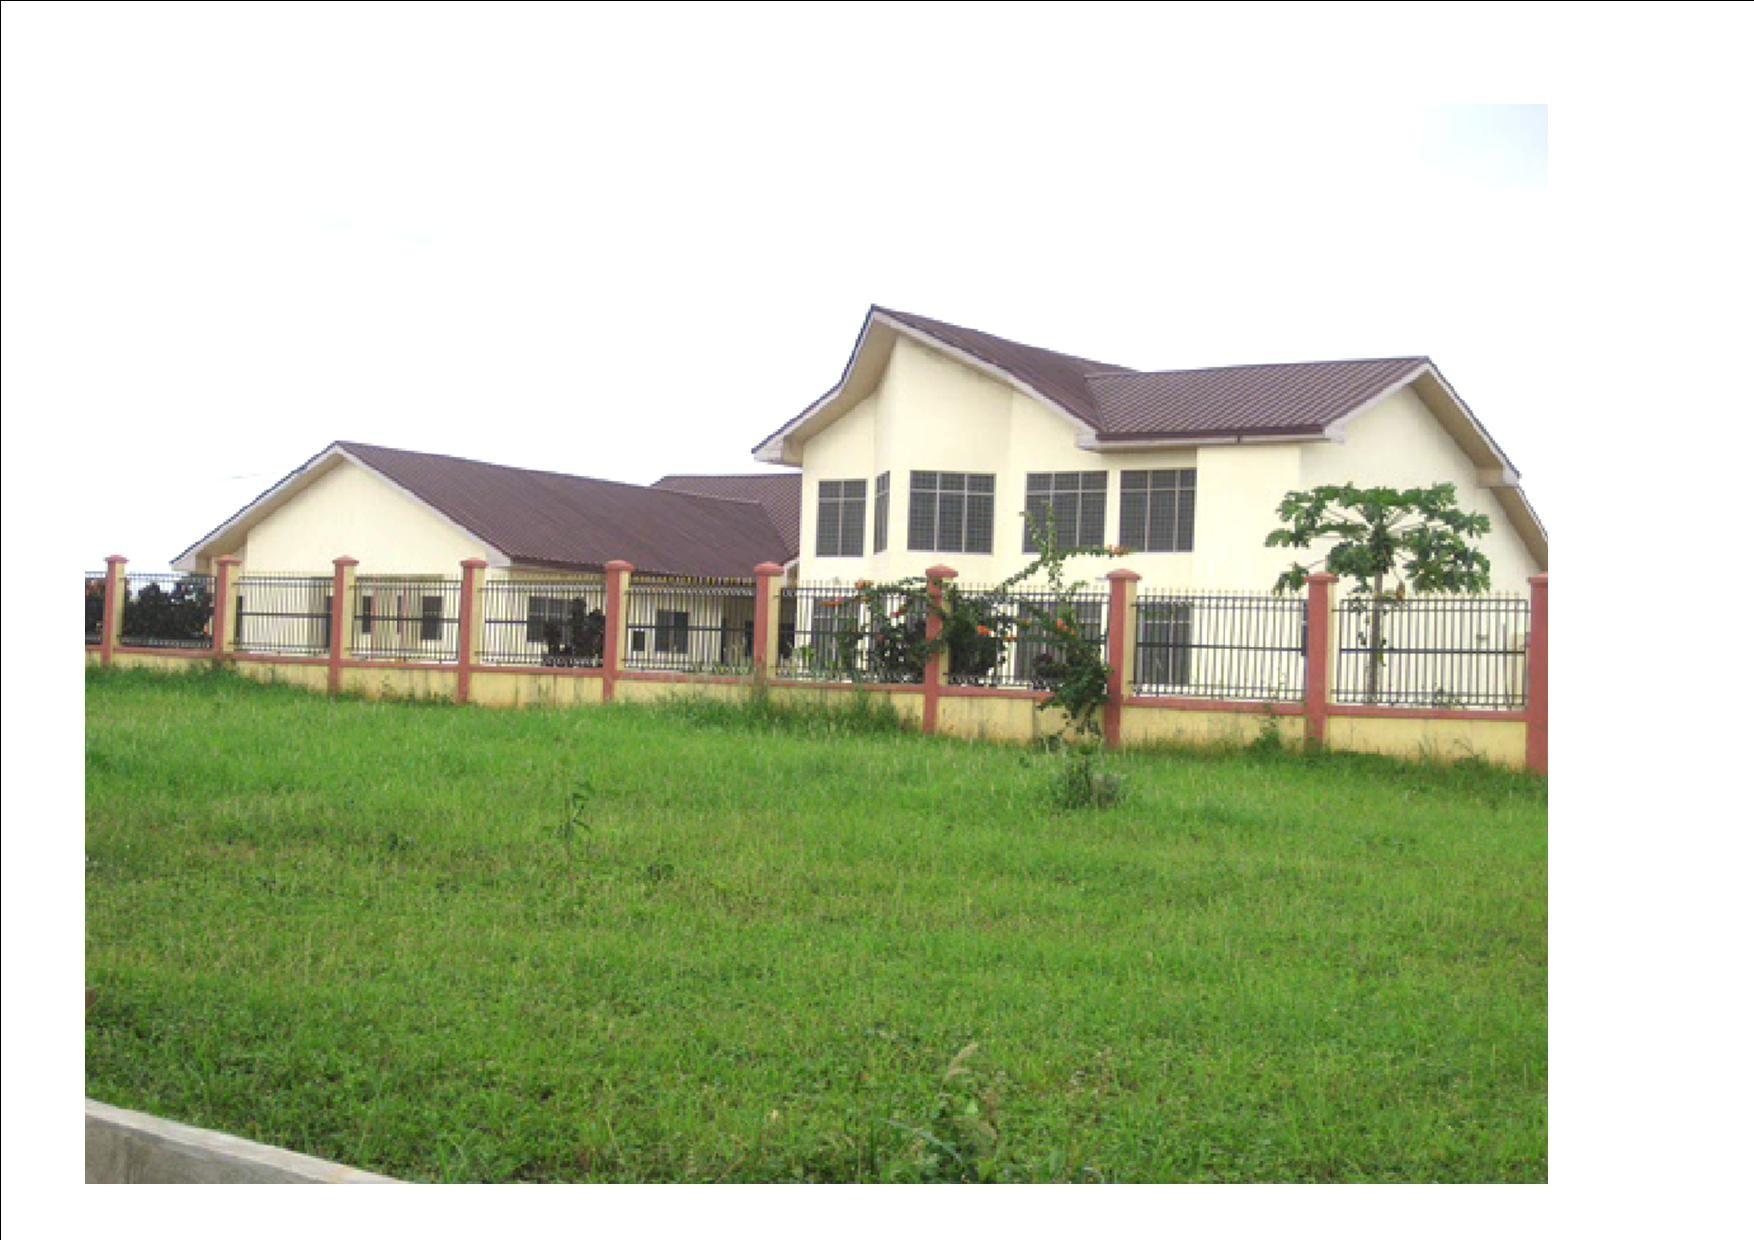 Casa di Formazione a Darbaa, Kumasi (Ghana)